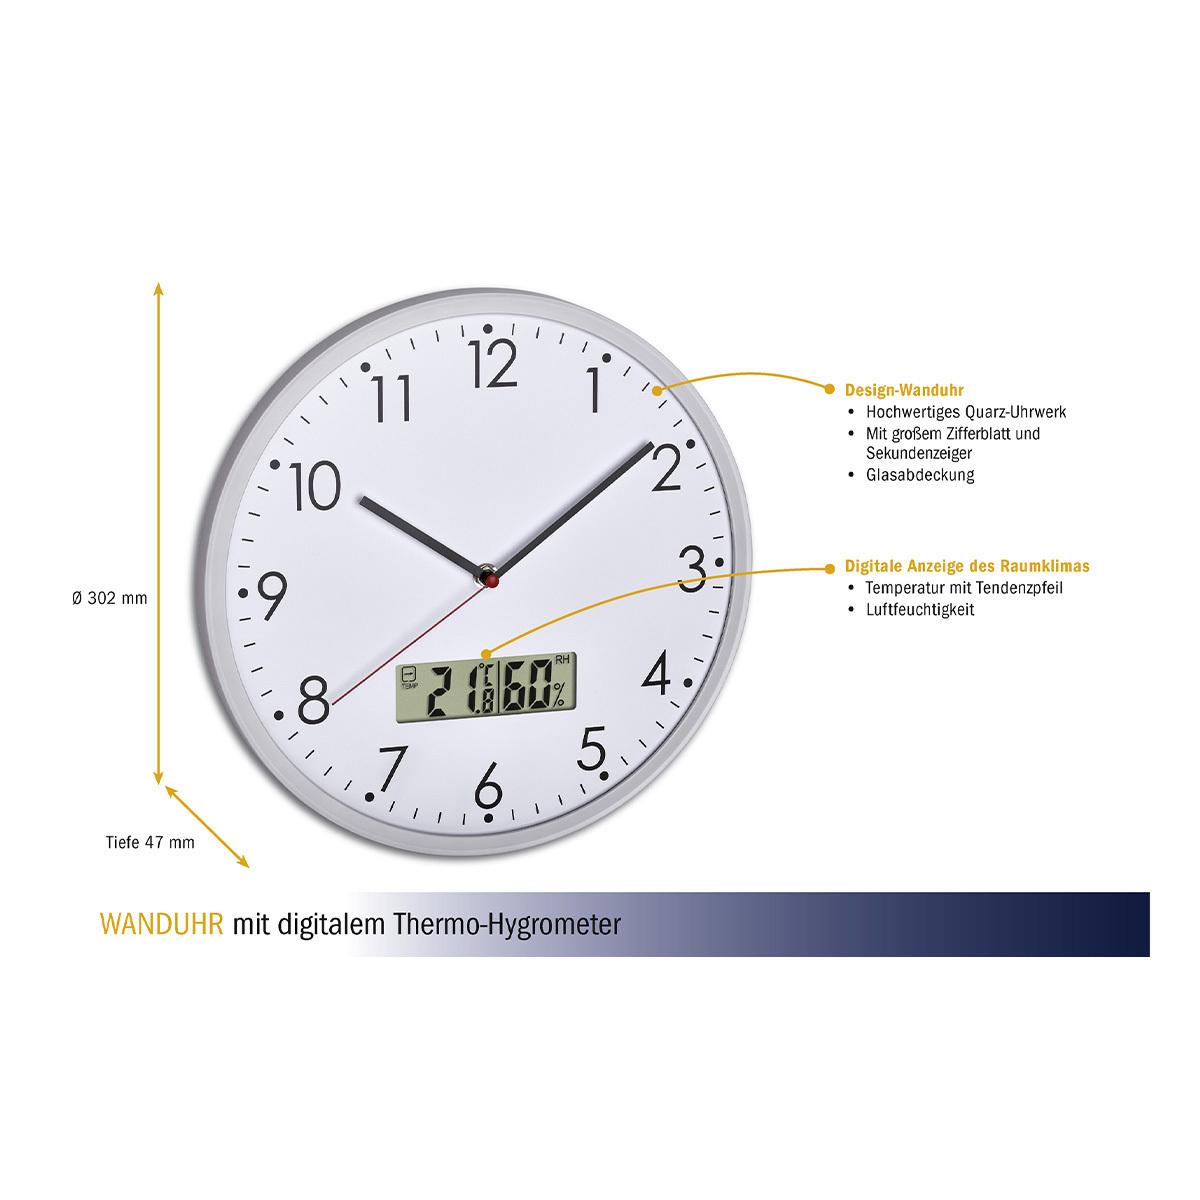 60-3048-02-analoge-wanduhr-mit-digitalem-themometer-hygrometer-abmessungen-1200x1200px.jpg